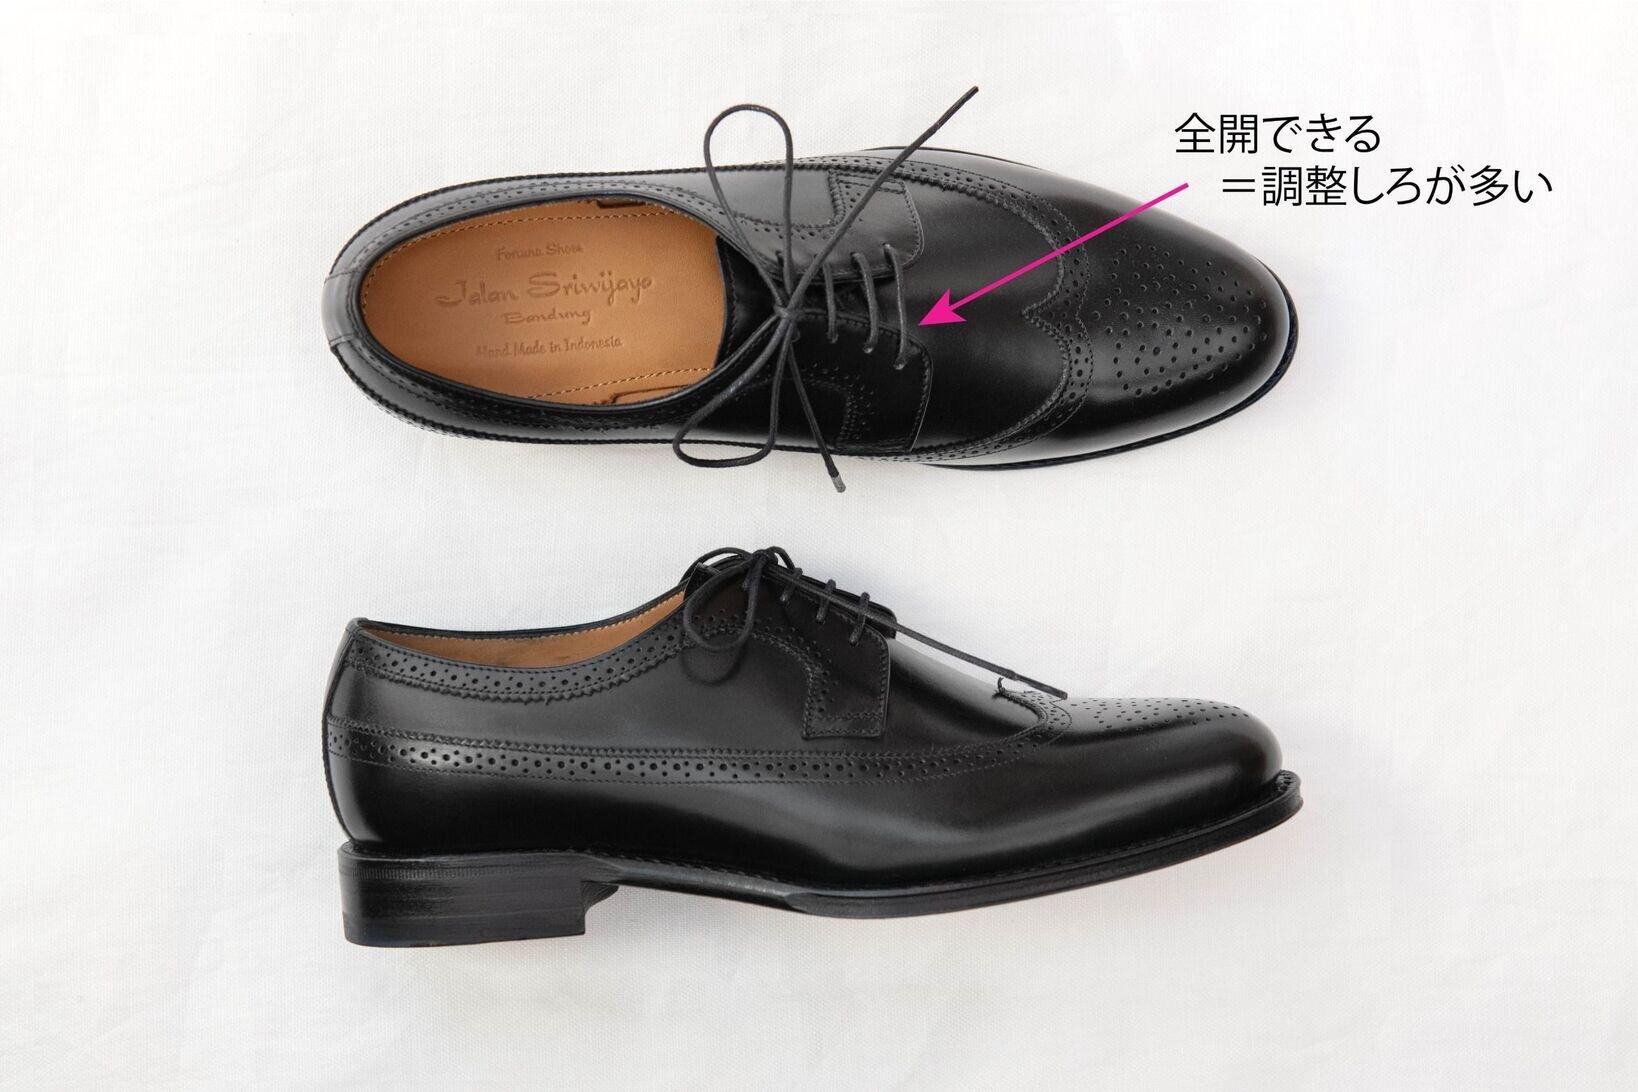 "「<a href=http://www.jalansriwijaya.com/collection/000065/ target='_blank'>5625</a>」¥32,000+税/ジャラン スリウァヤ(GMT) ▶︎靴の詳細は<a href=""https://muuseo.com/square/articles/1322"" target=""_blank"">連載第2回</a>をチェック!"